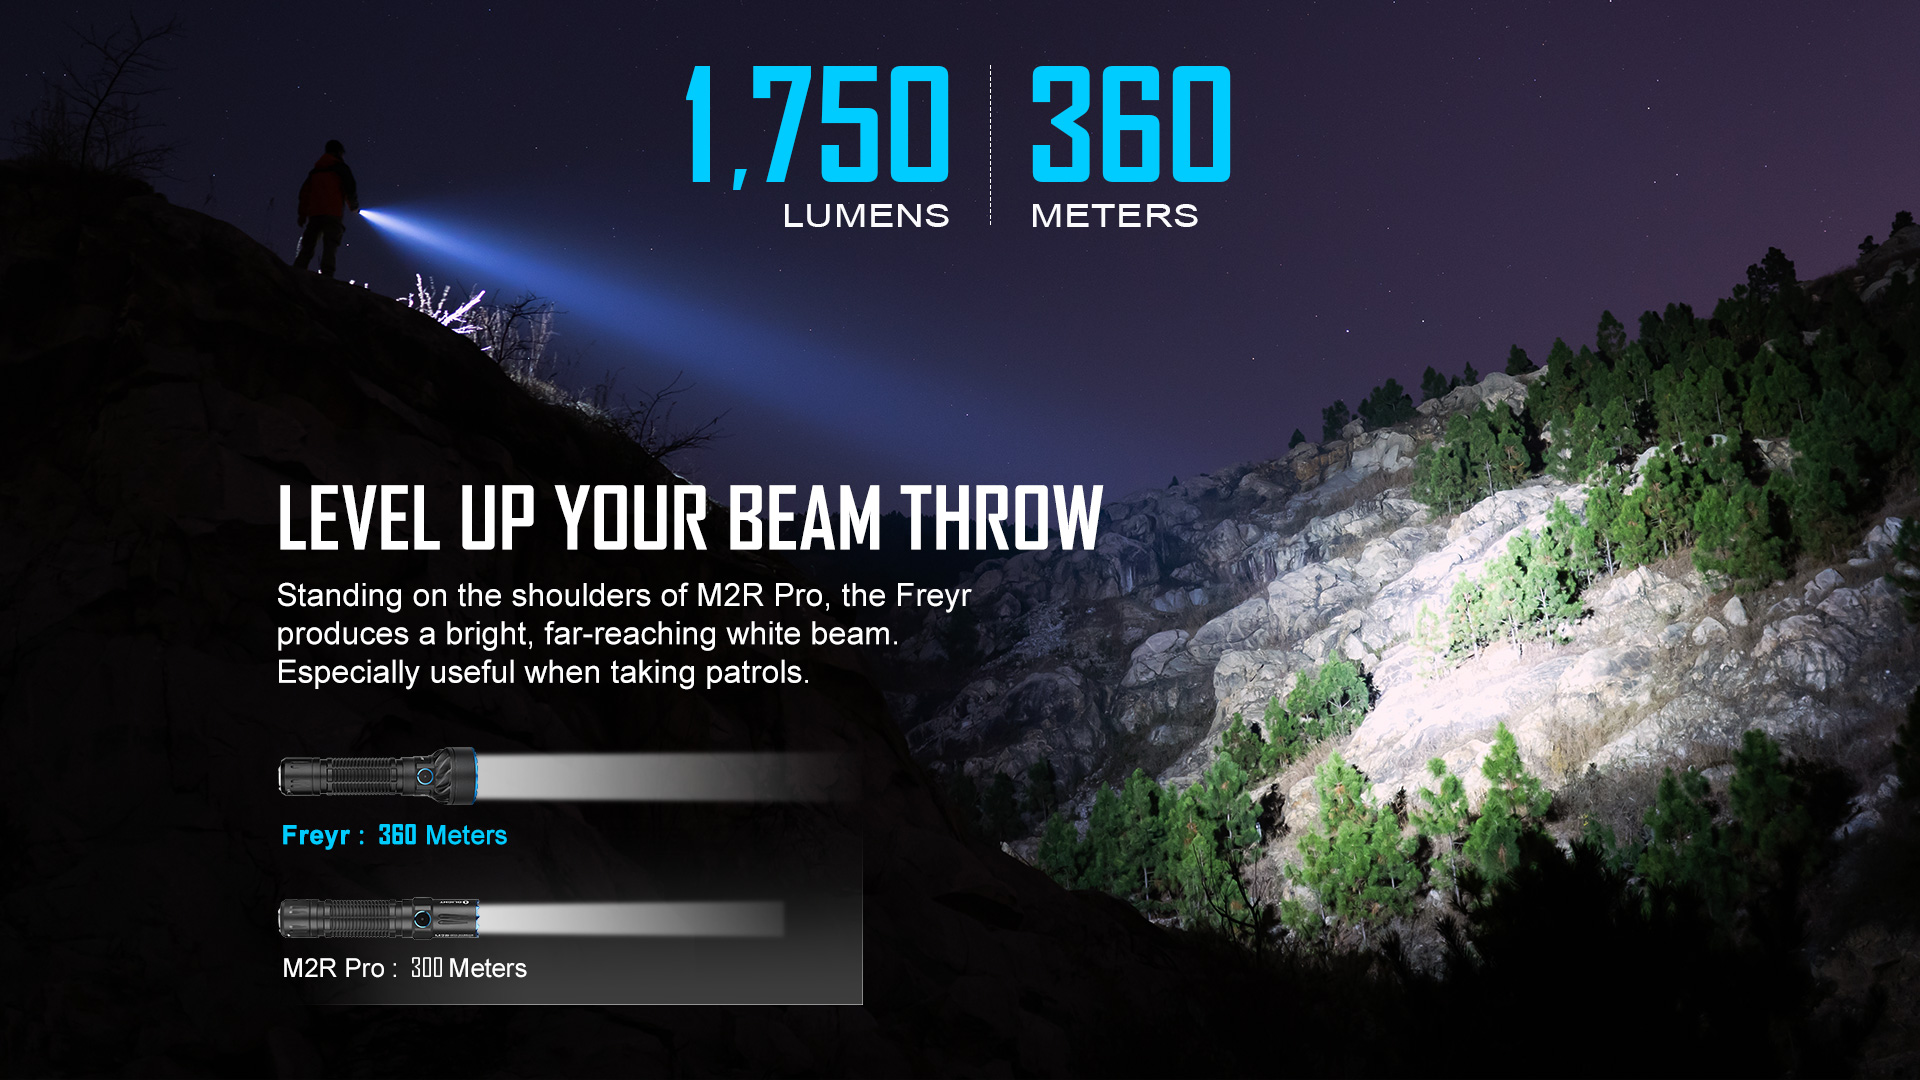 Olight Freyr multi color handheld flashlight 360 meters